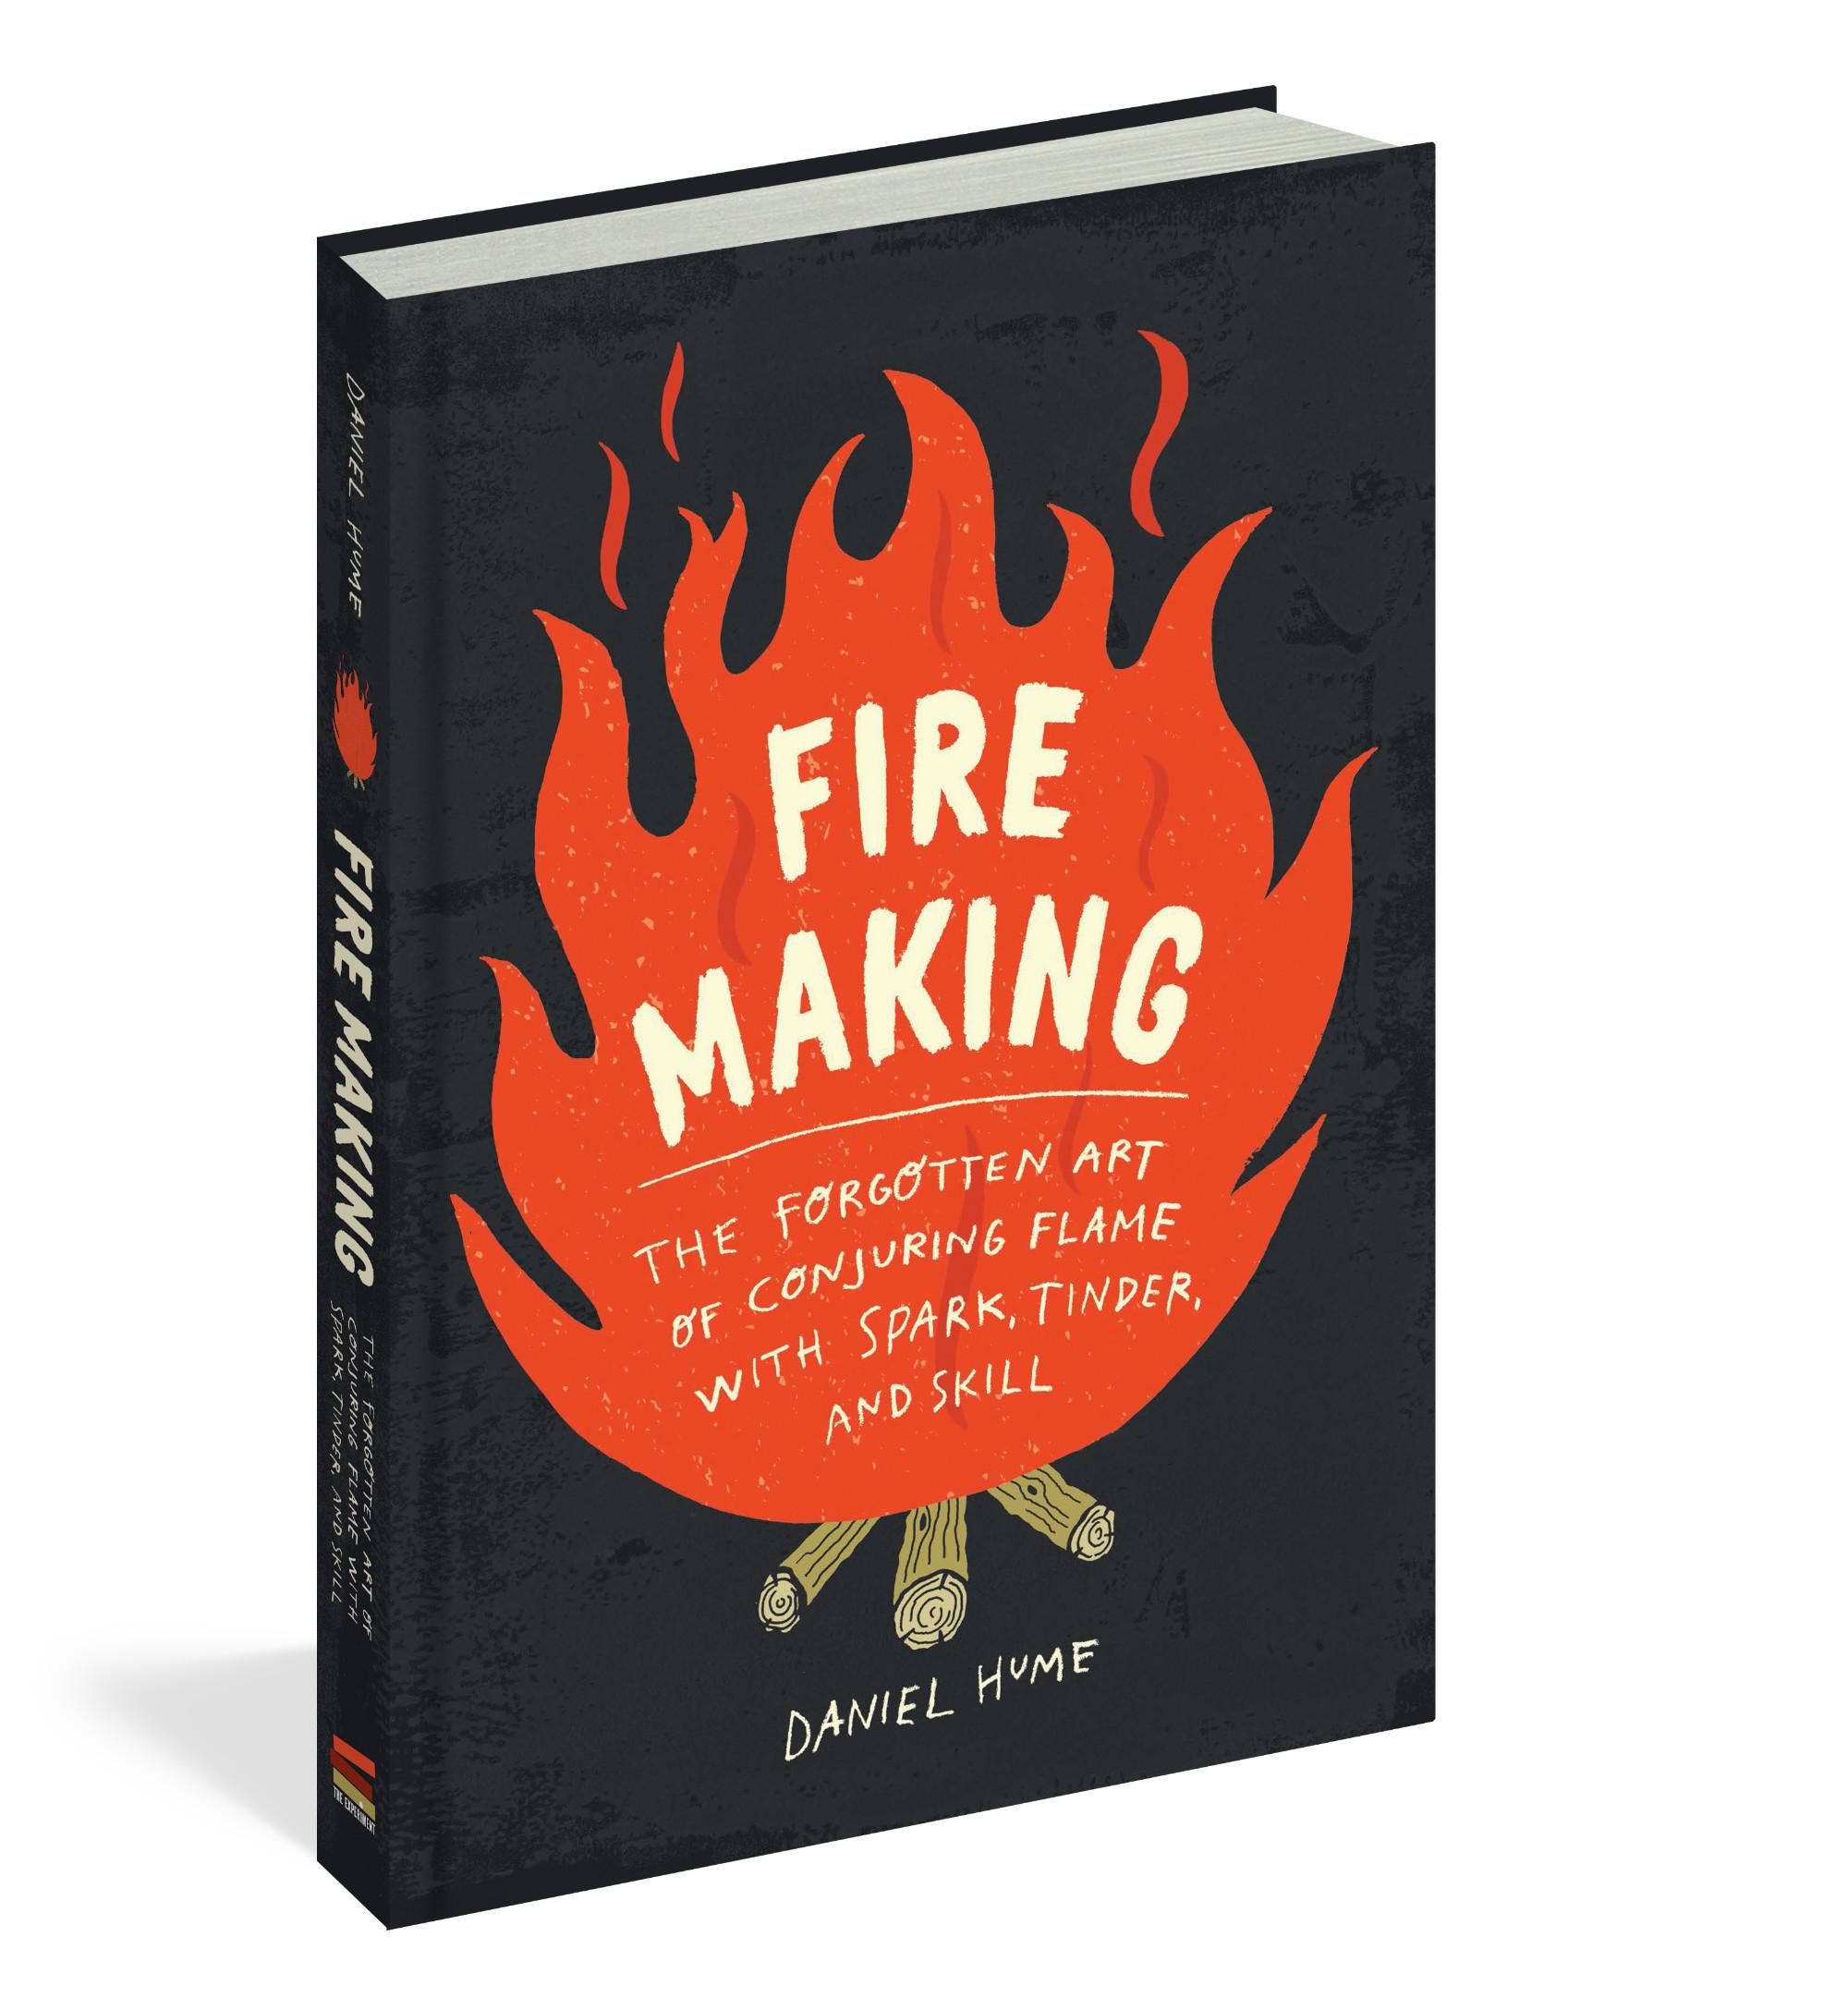 FireMakingBook.jpg